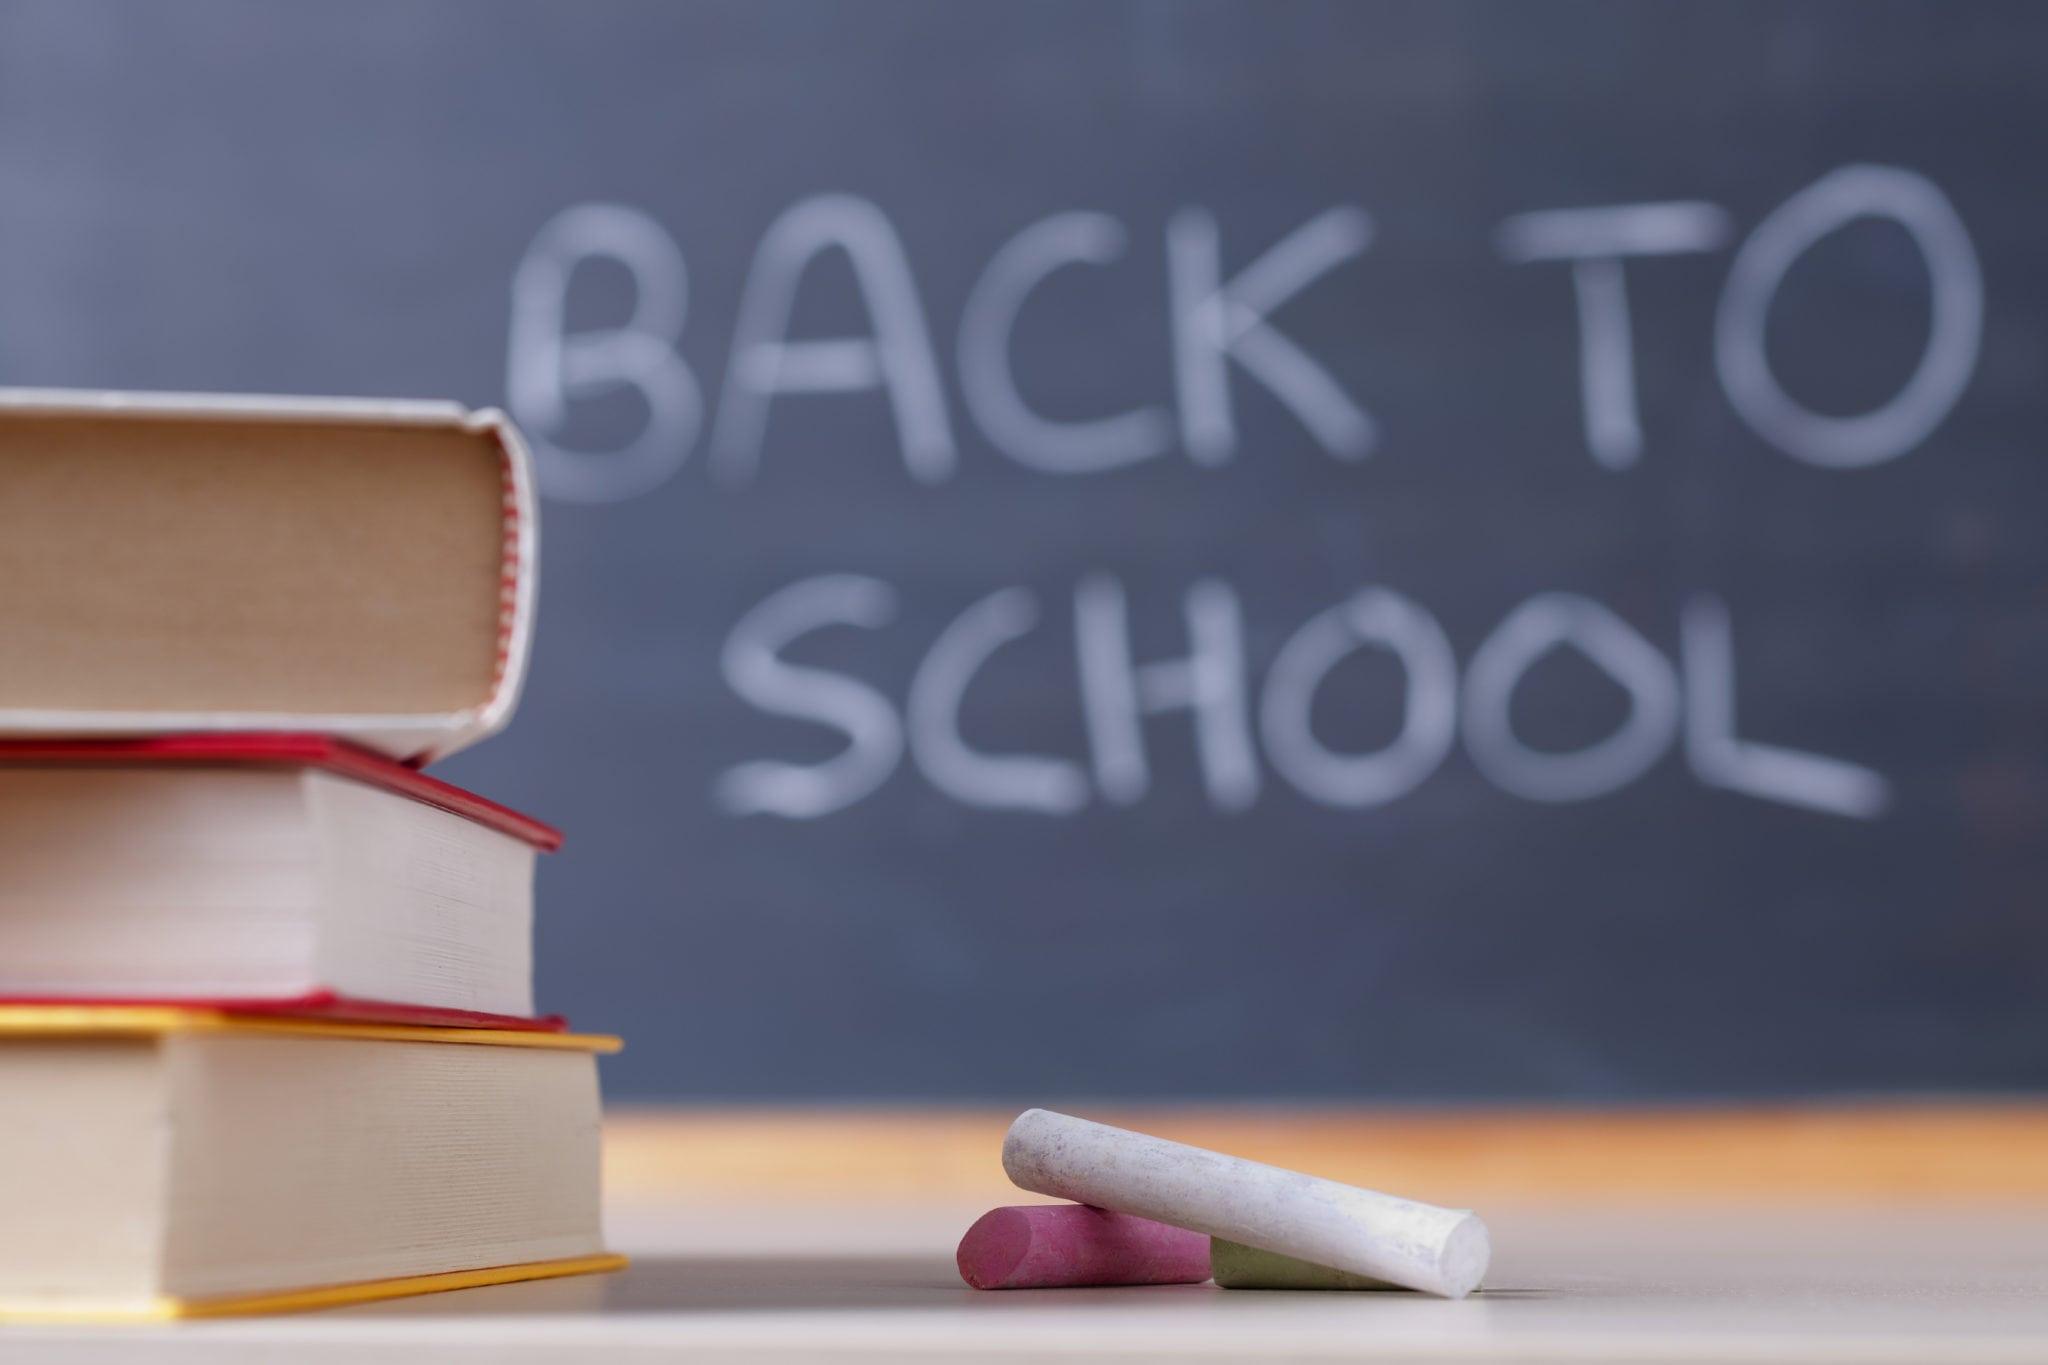 Back To School Savings